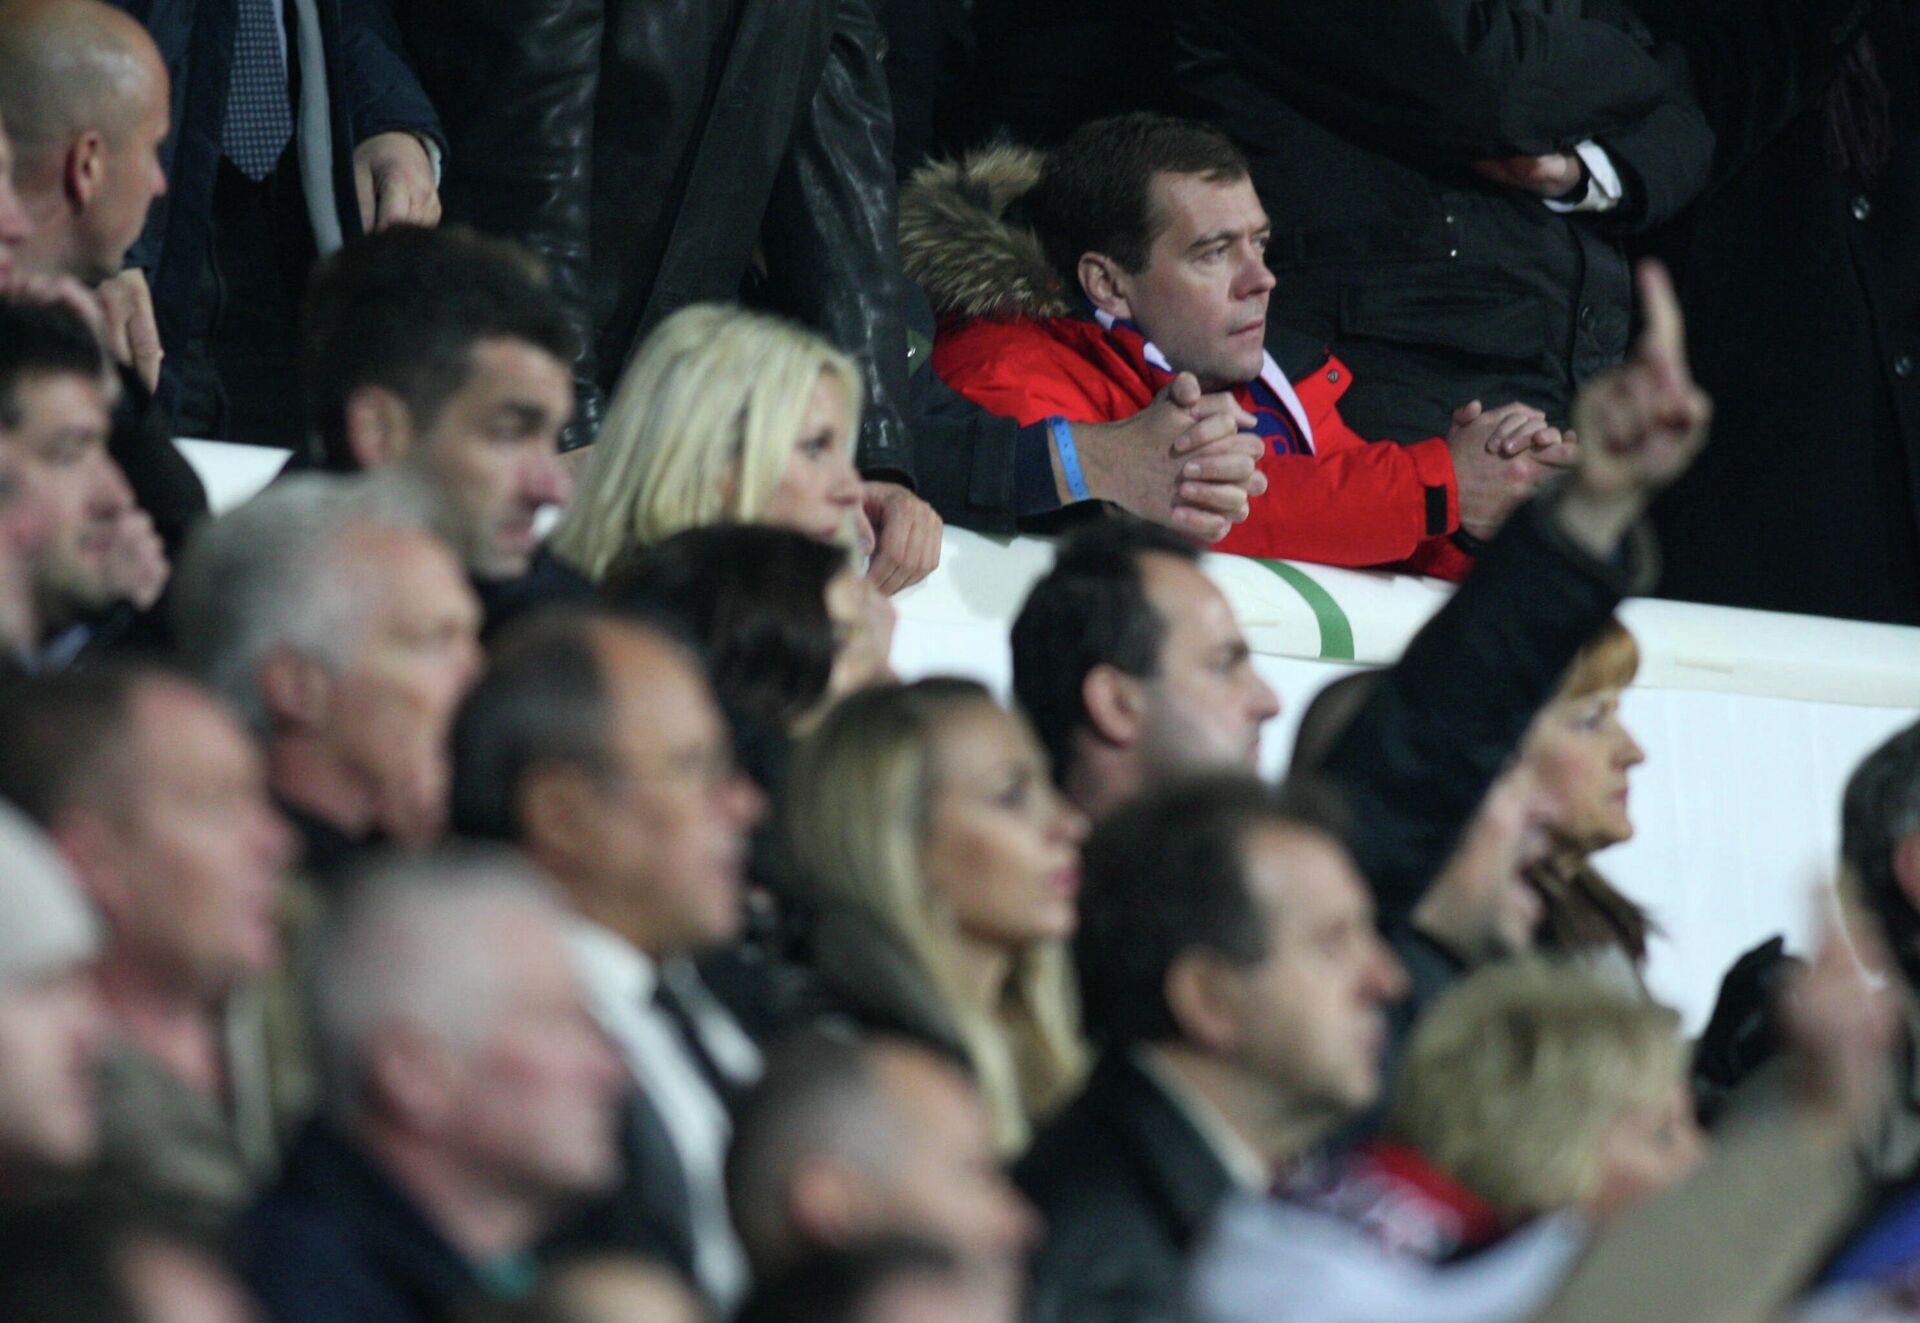 Дмитрий Медведев на матче Словения - Россия в Мариборе, 2009 - РИА Новости, 1920, 09.10.2021